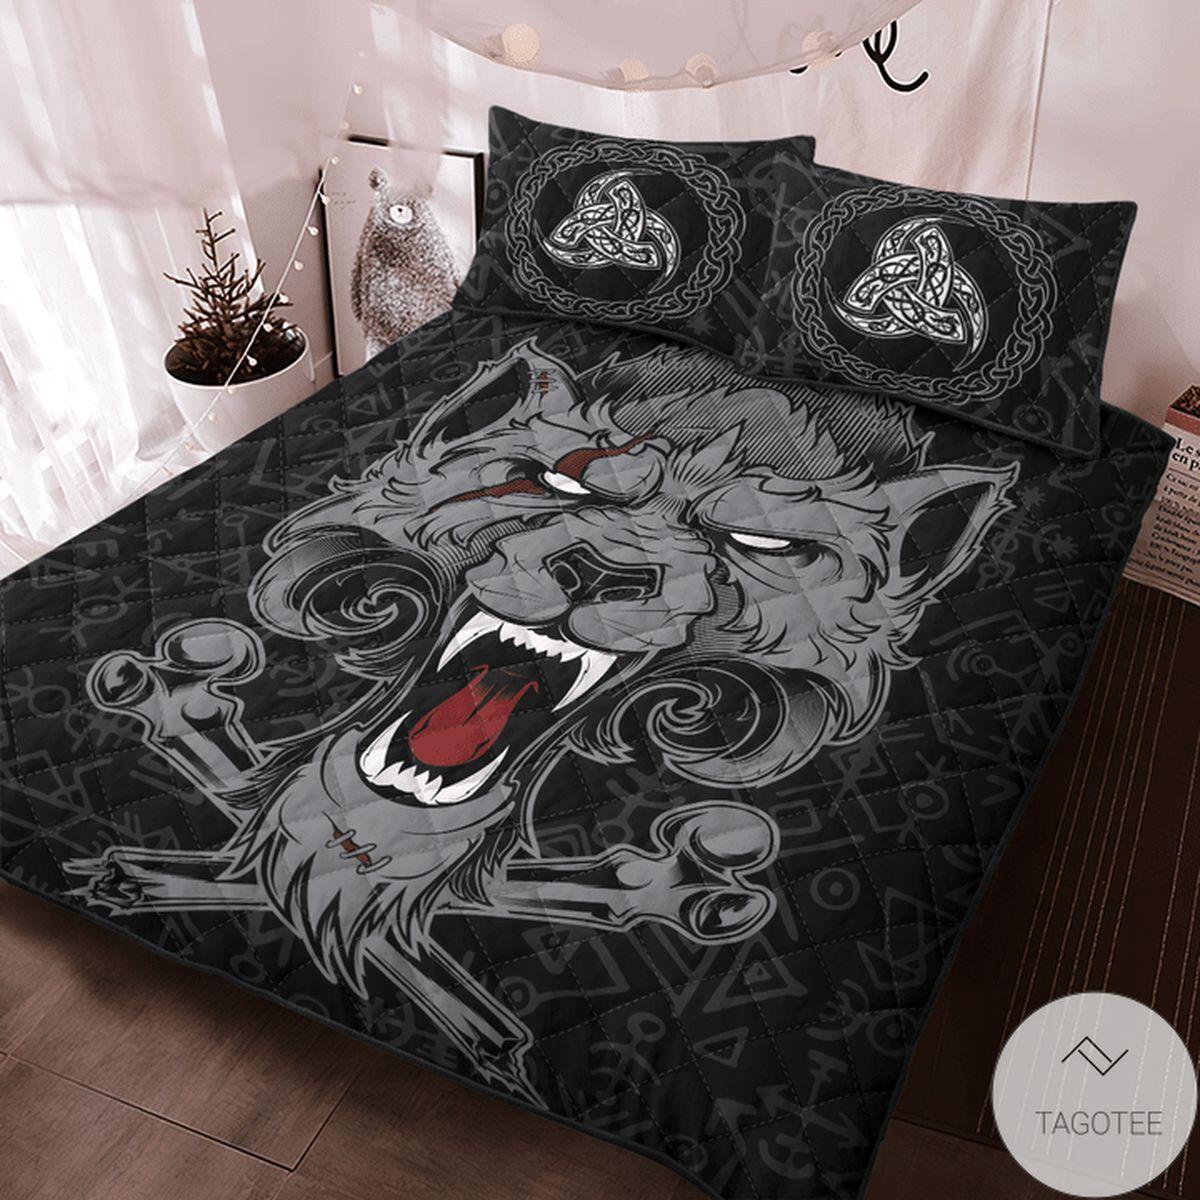 Free Viking Dead Wolf Fenrir Quilt Bedding Set